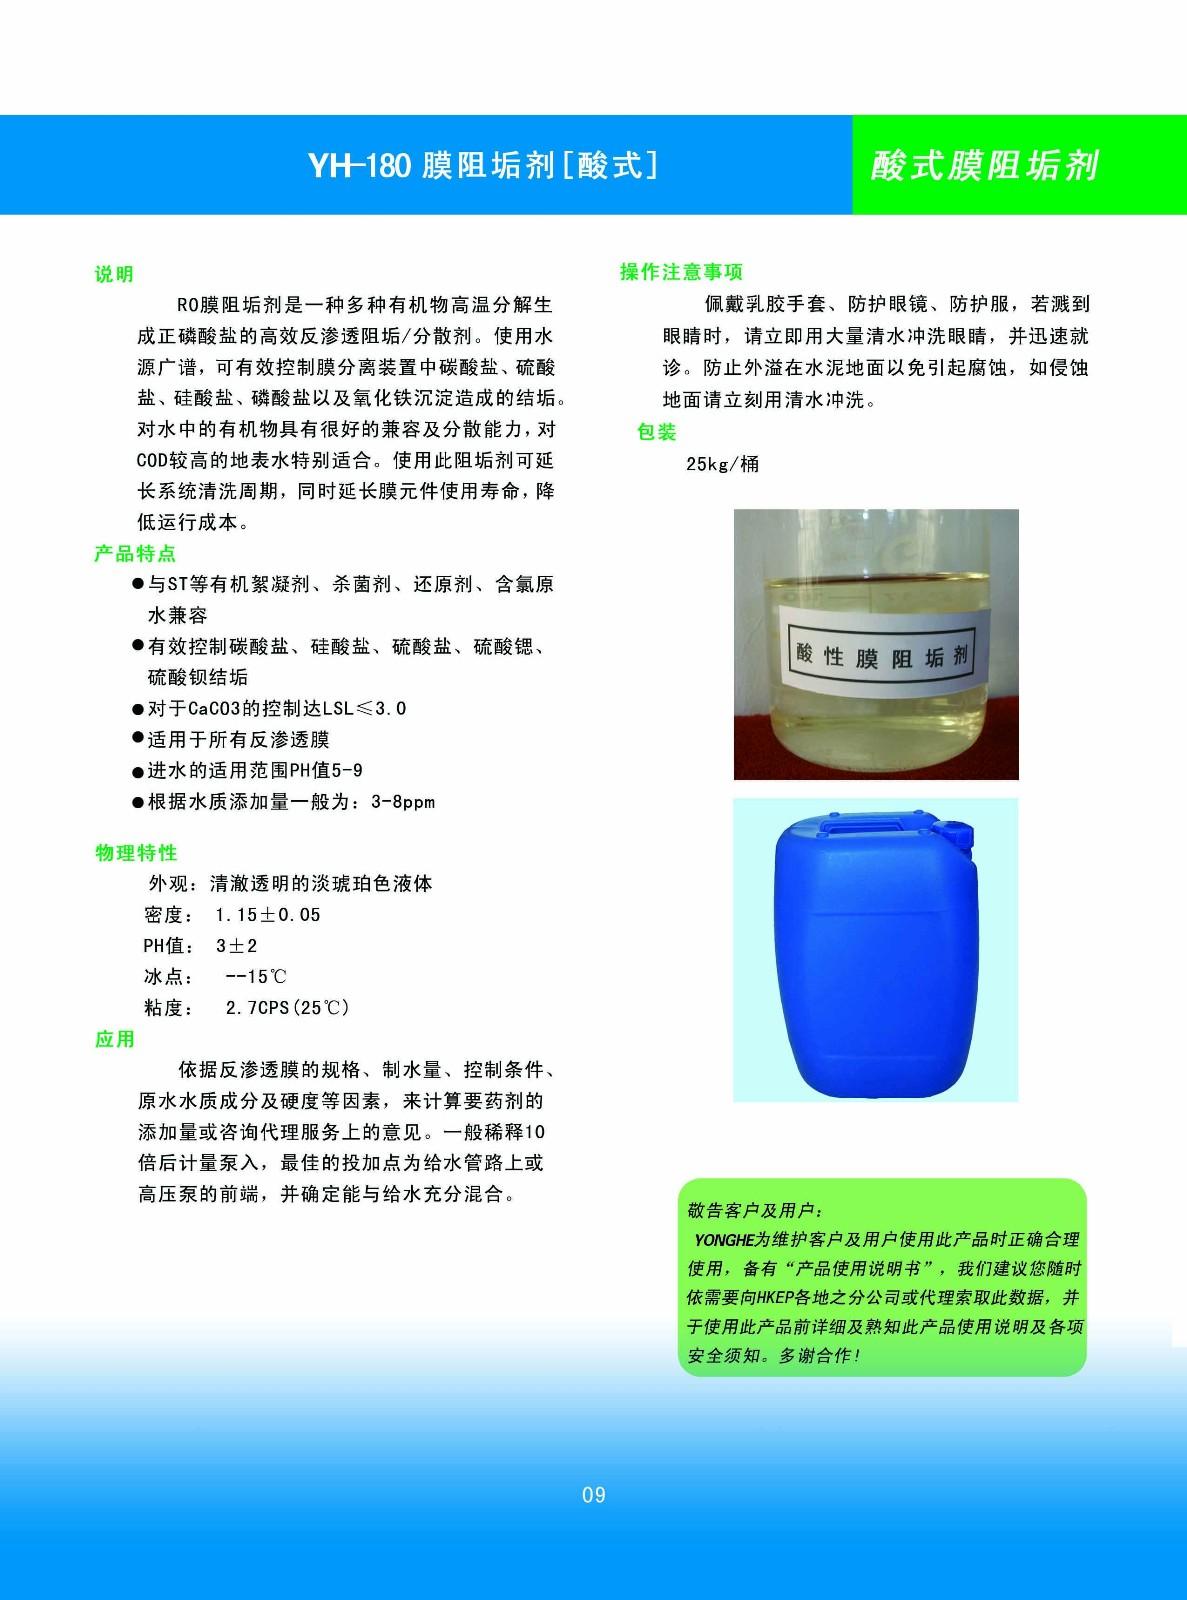 09 YH-180 酸式膜阻垢剂标准液.jpg